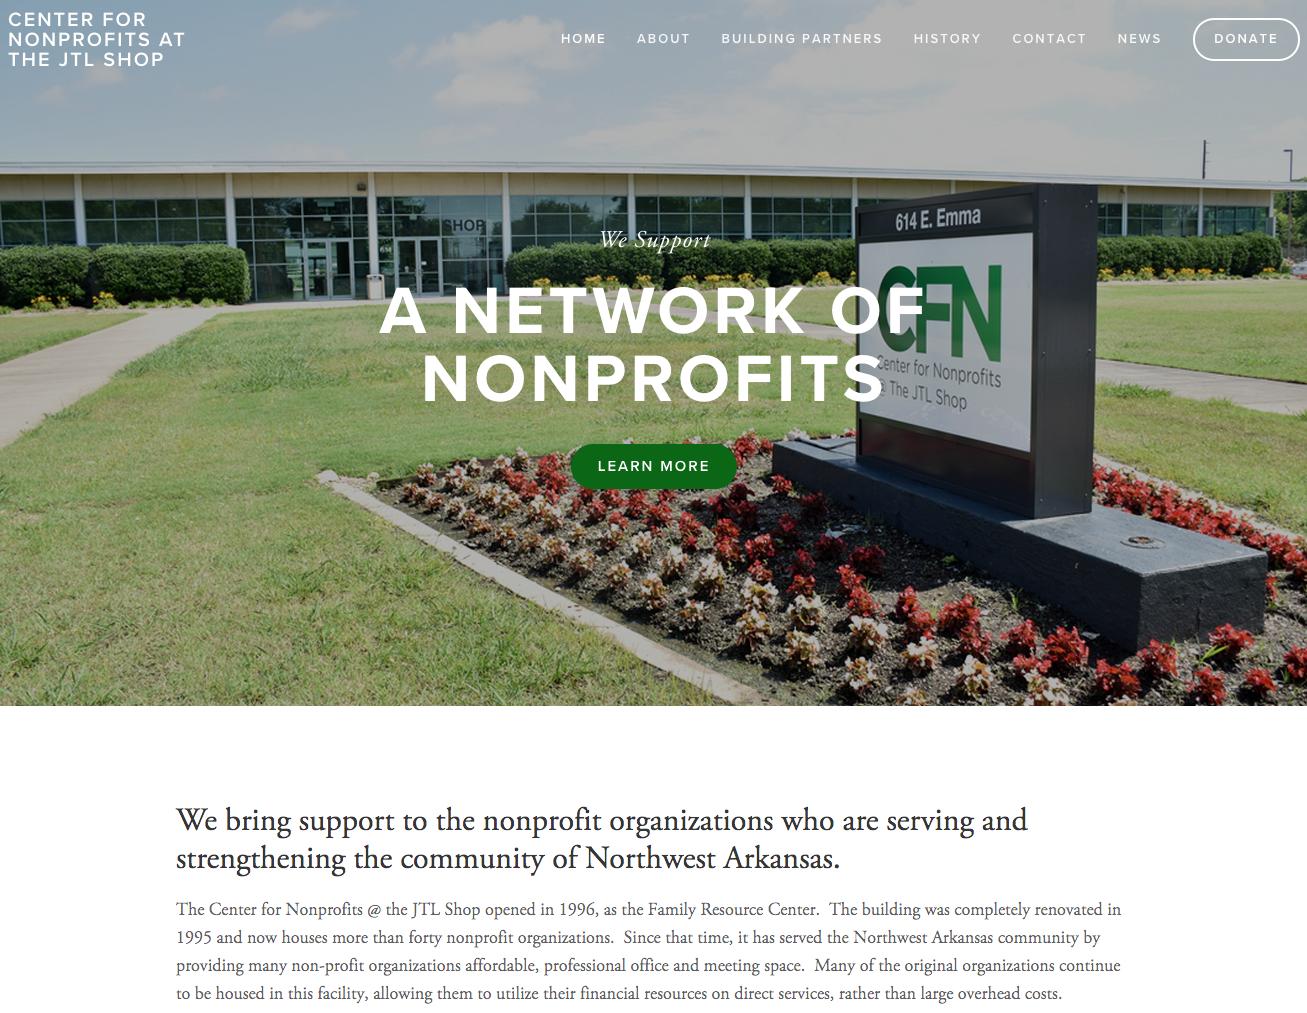 cfn, jtl shop, center for nonprofits, bernice jones, harvey jones, springdale, northwest arkansas, nwark,